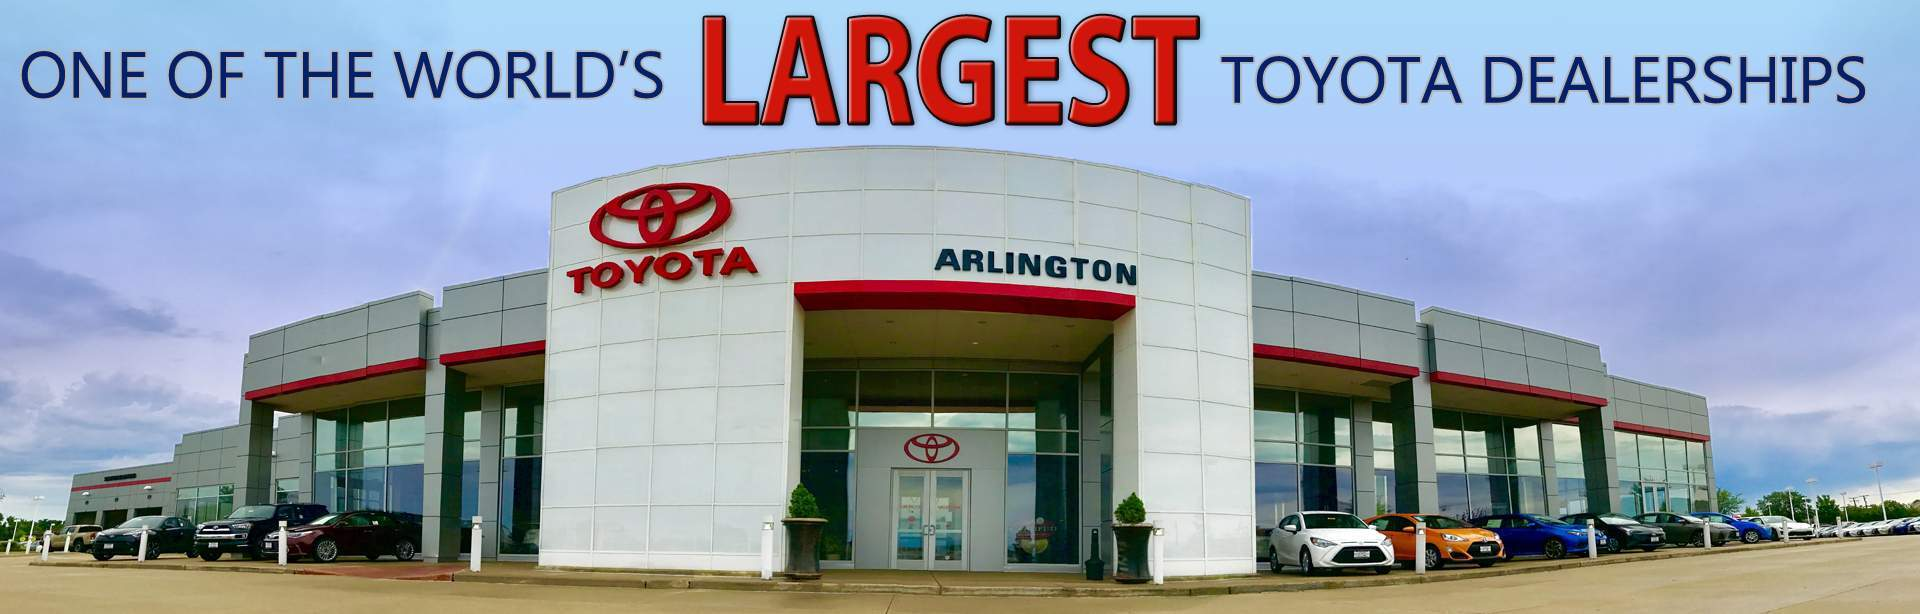 Arlington Toyota - Toyota dealership hours